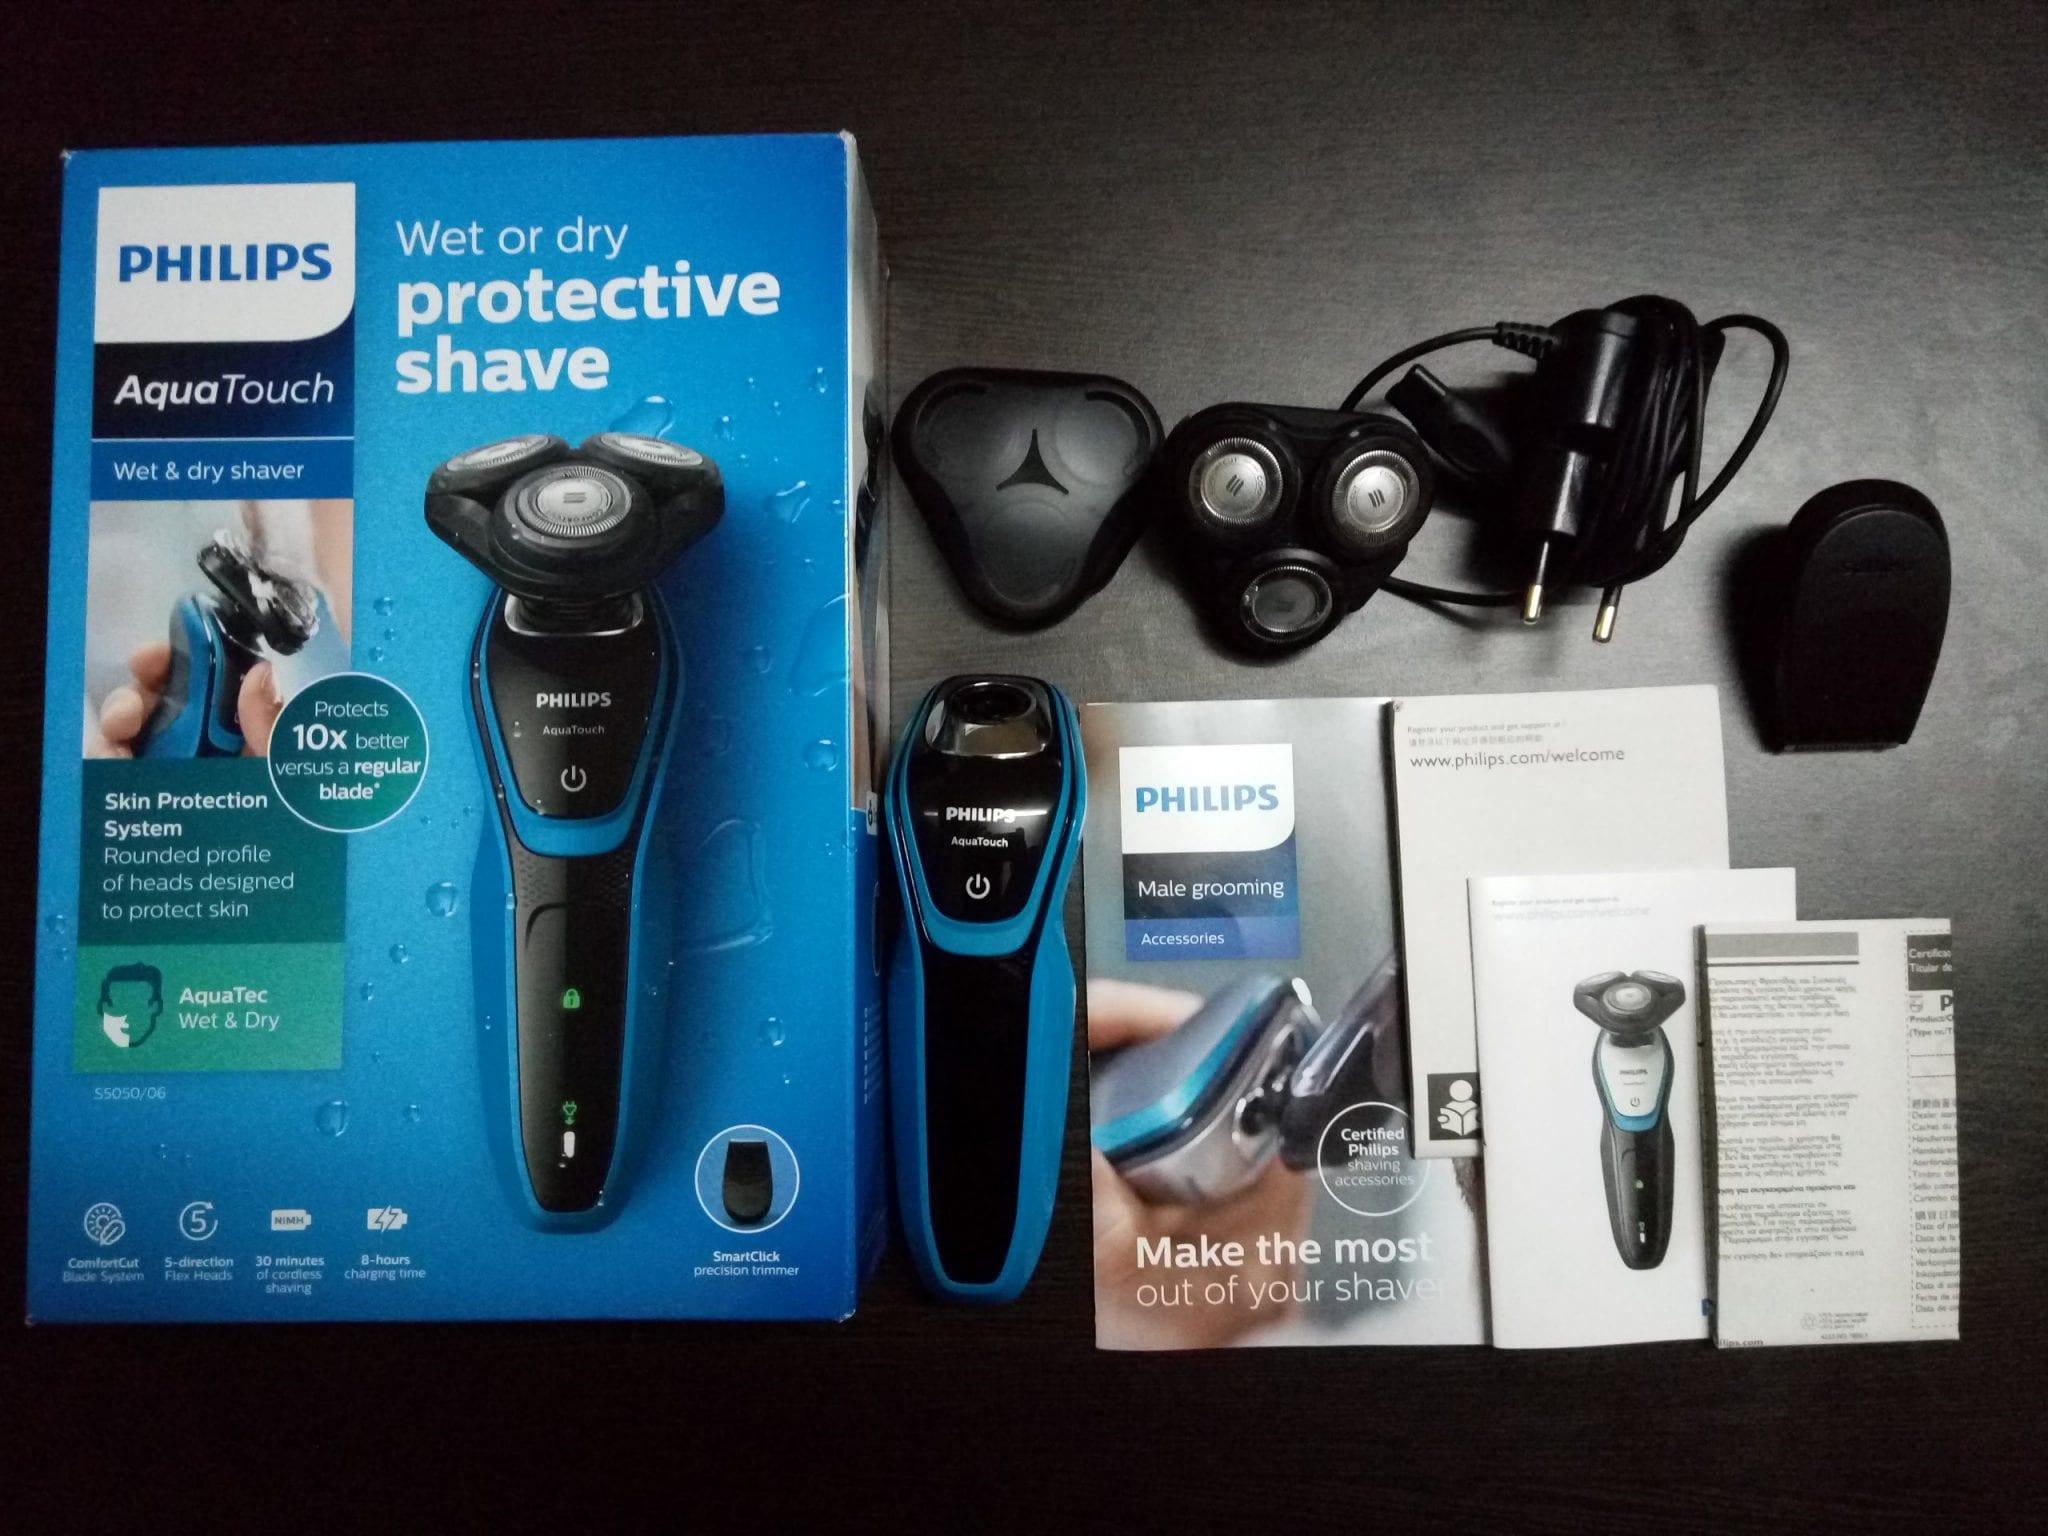 Philips AquaTouch S5050/06 Shaver